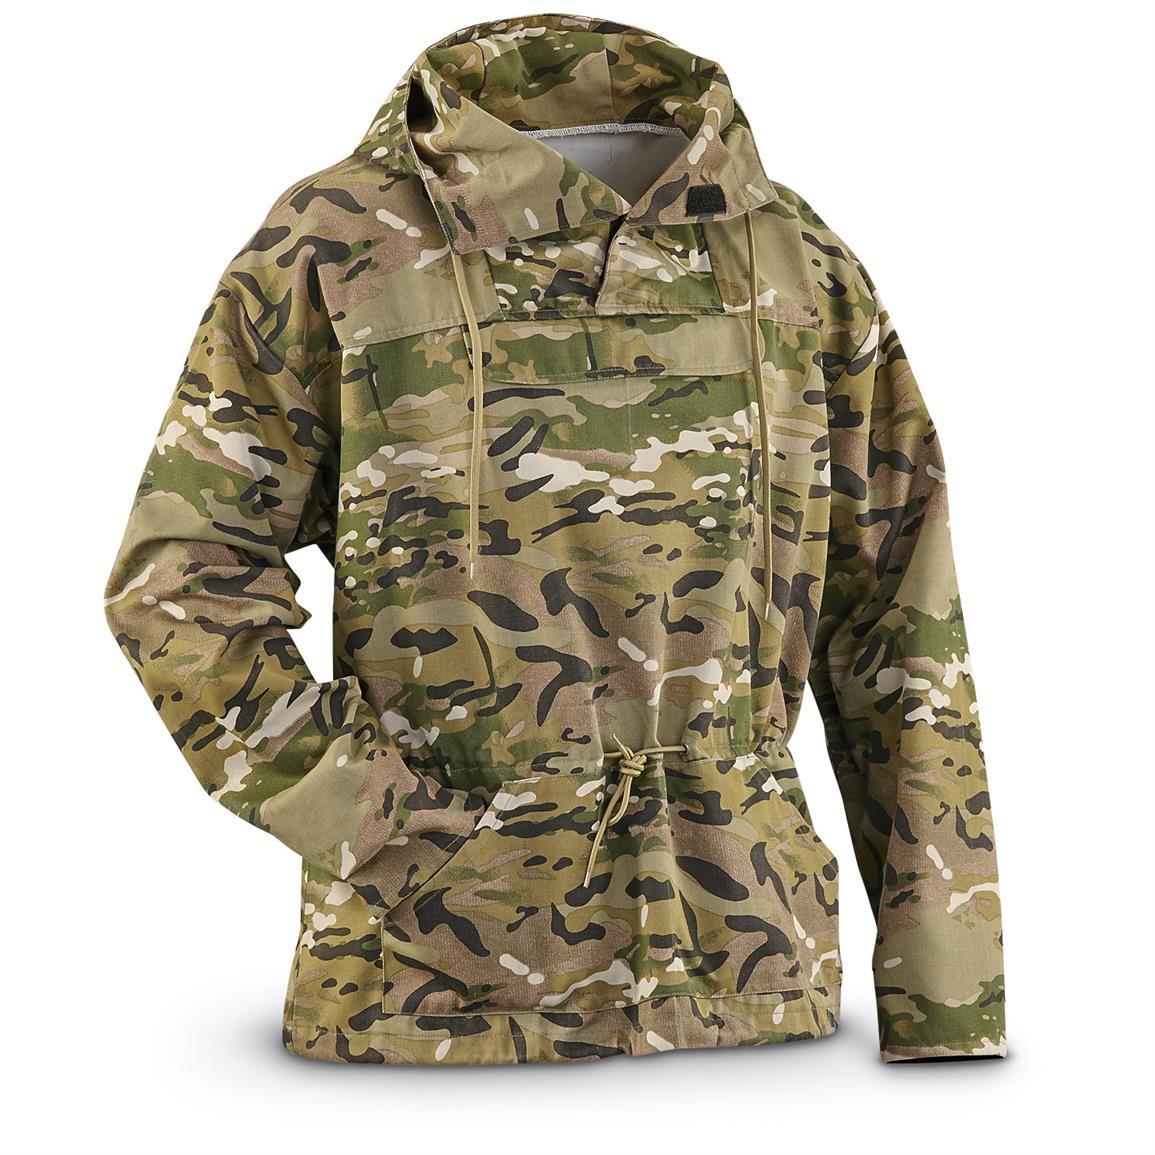 military jackets u.s. military surplus menu0027s ocp camo anorak jacket, new hpwqeiv